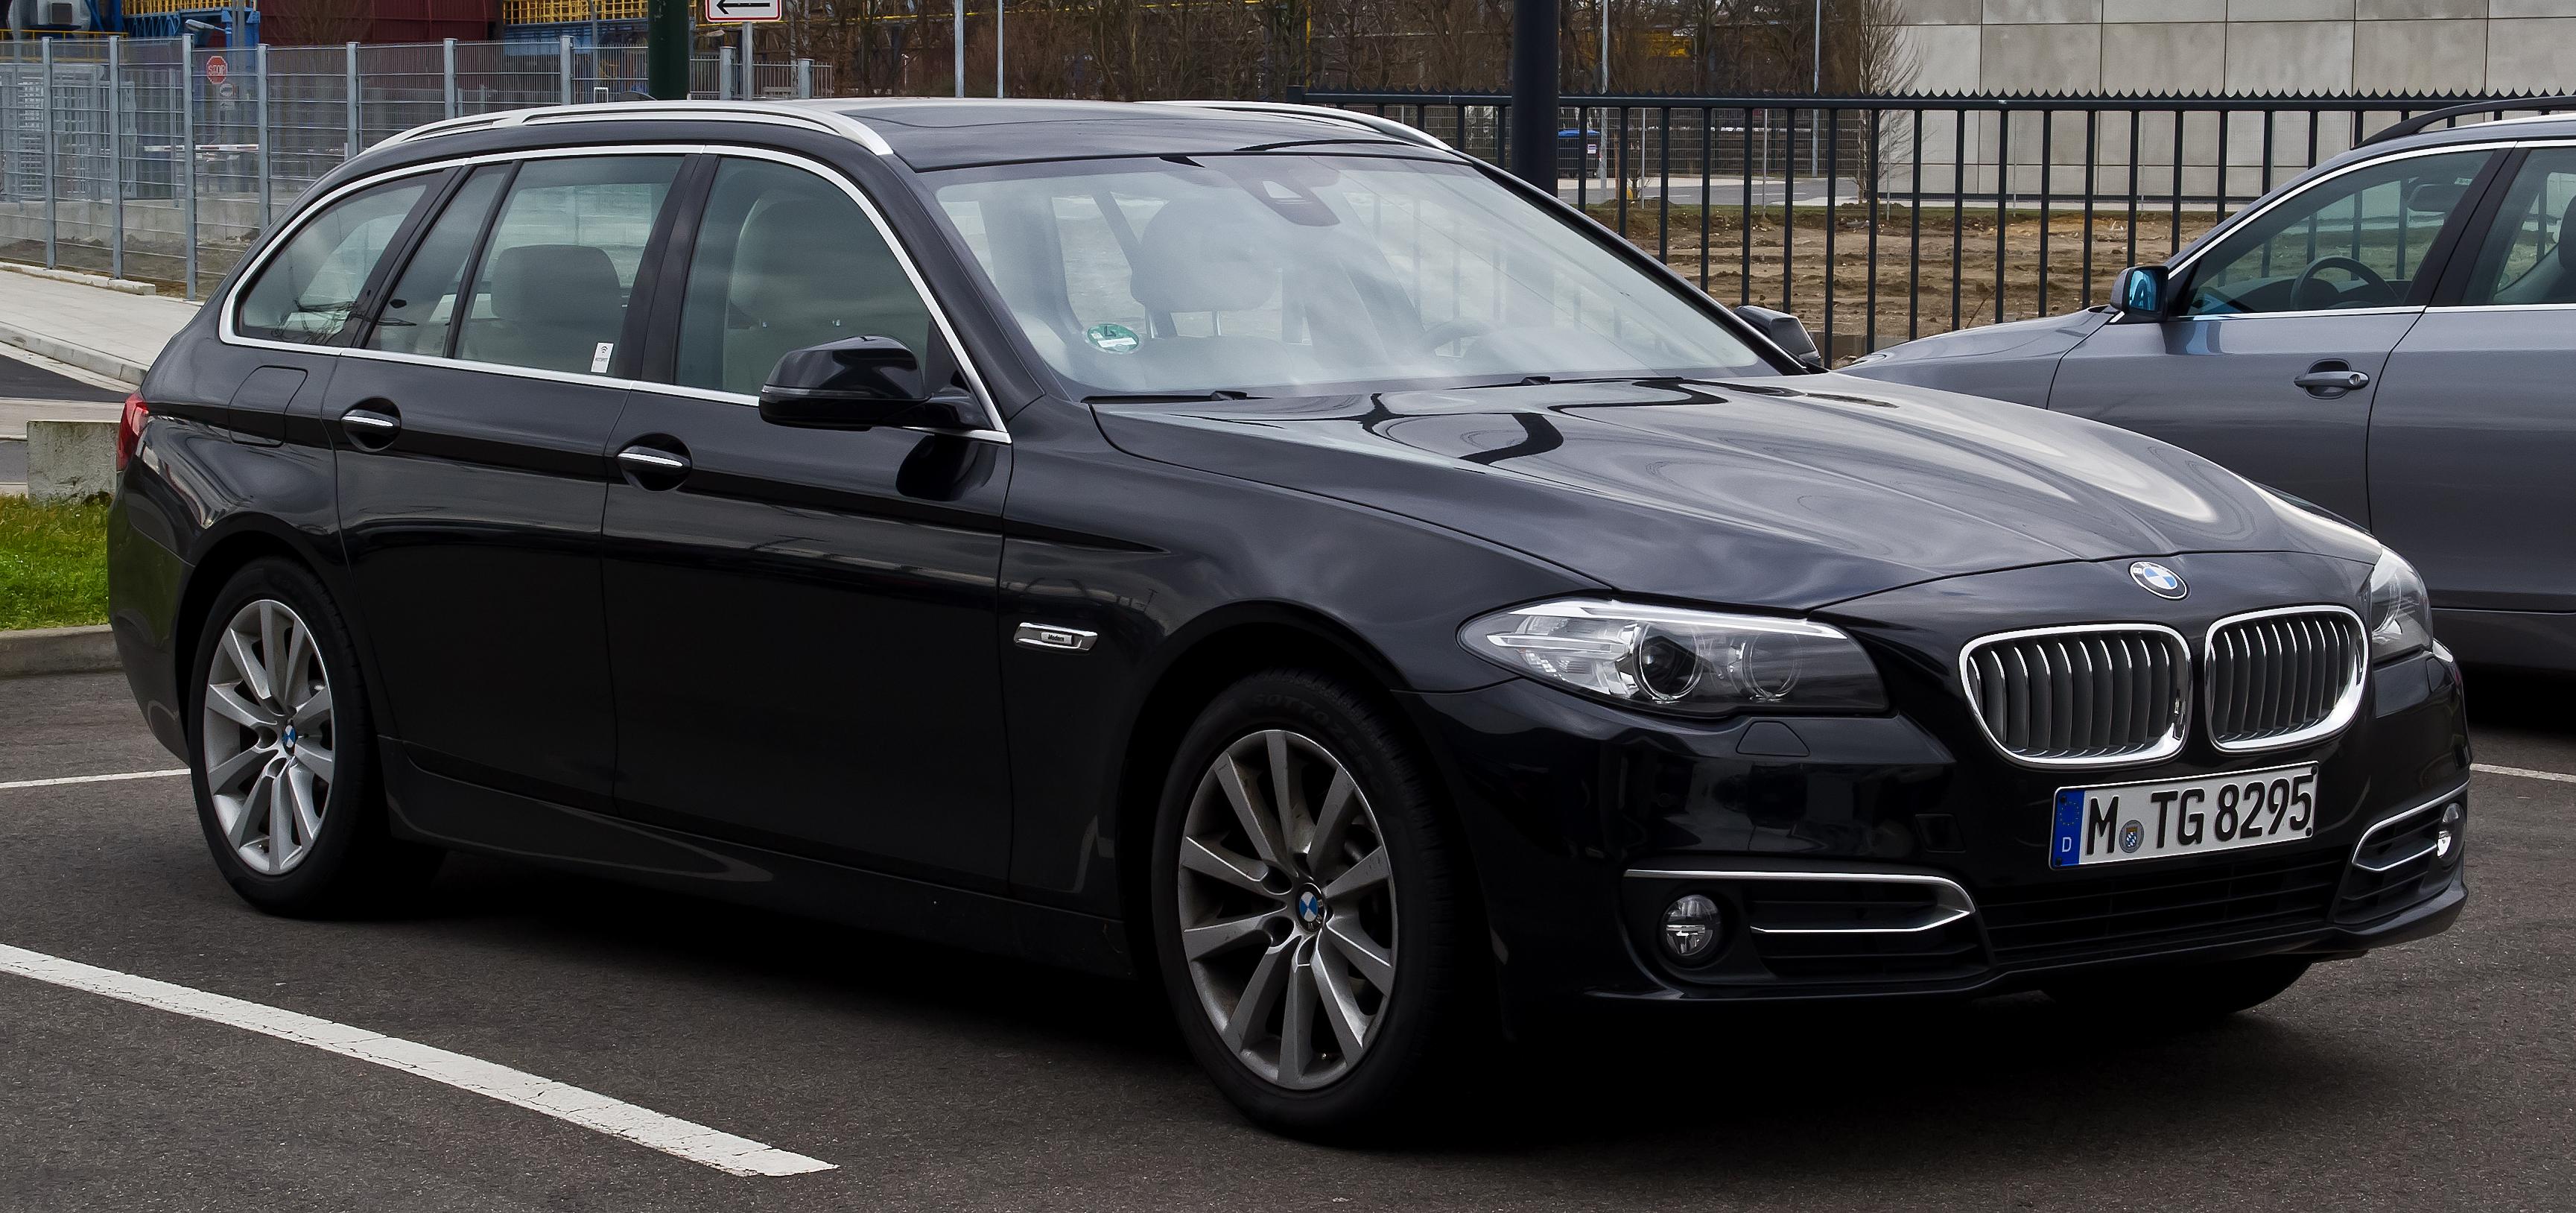 File:BMW 520i Touring Modern Line (F11, Facelift) – Frontansicht, 22